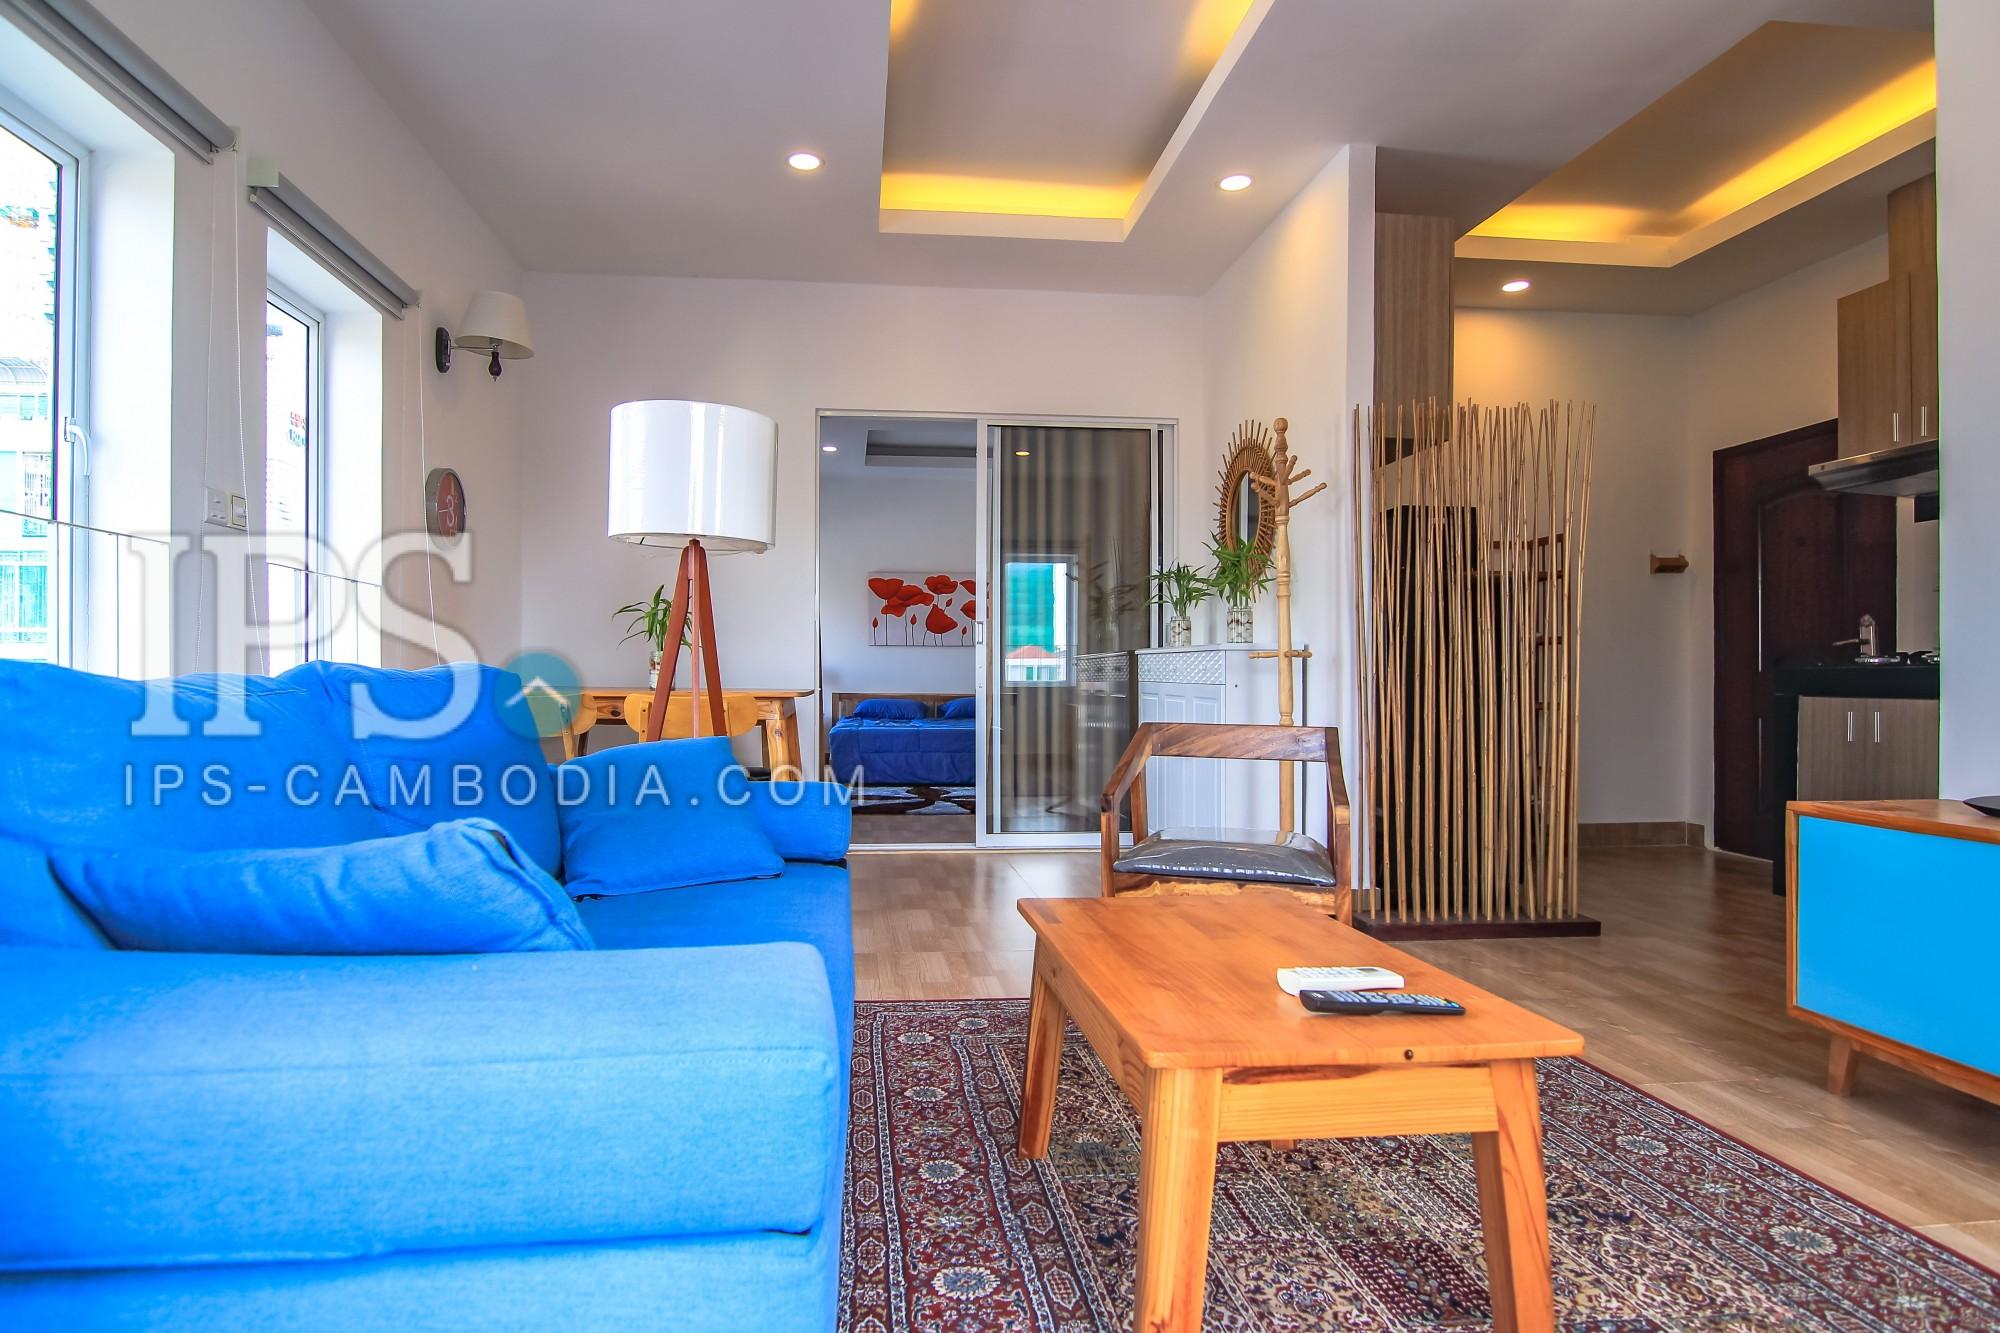 Exclusive 1 Bedroom Apartment For Rent - Boeung Trabek, Phnom Penh